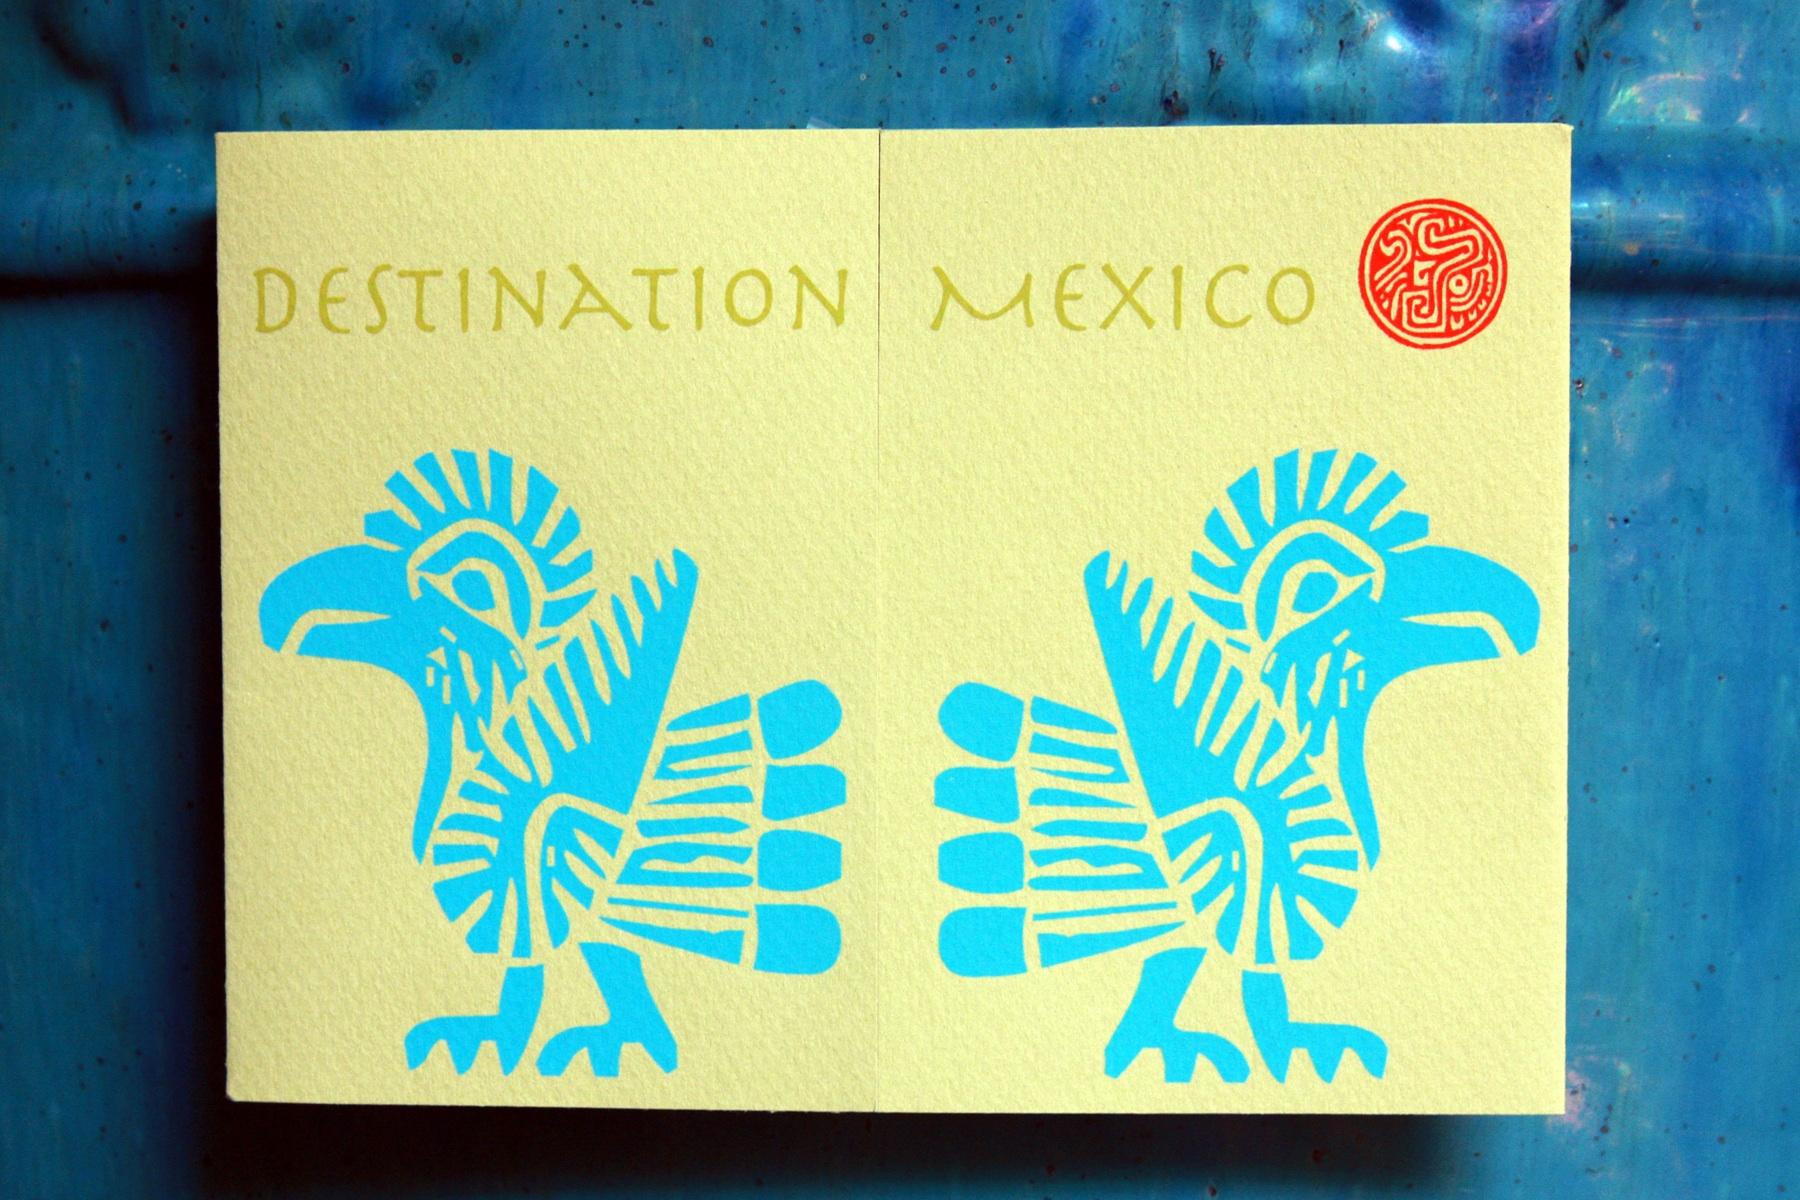 wedding invitations destination mexico mexican wedding invitations Mexico Wedding Invitations